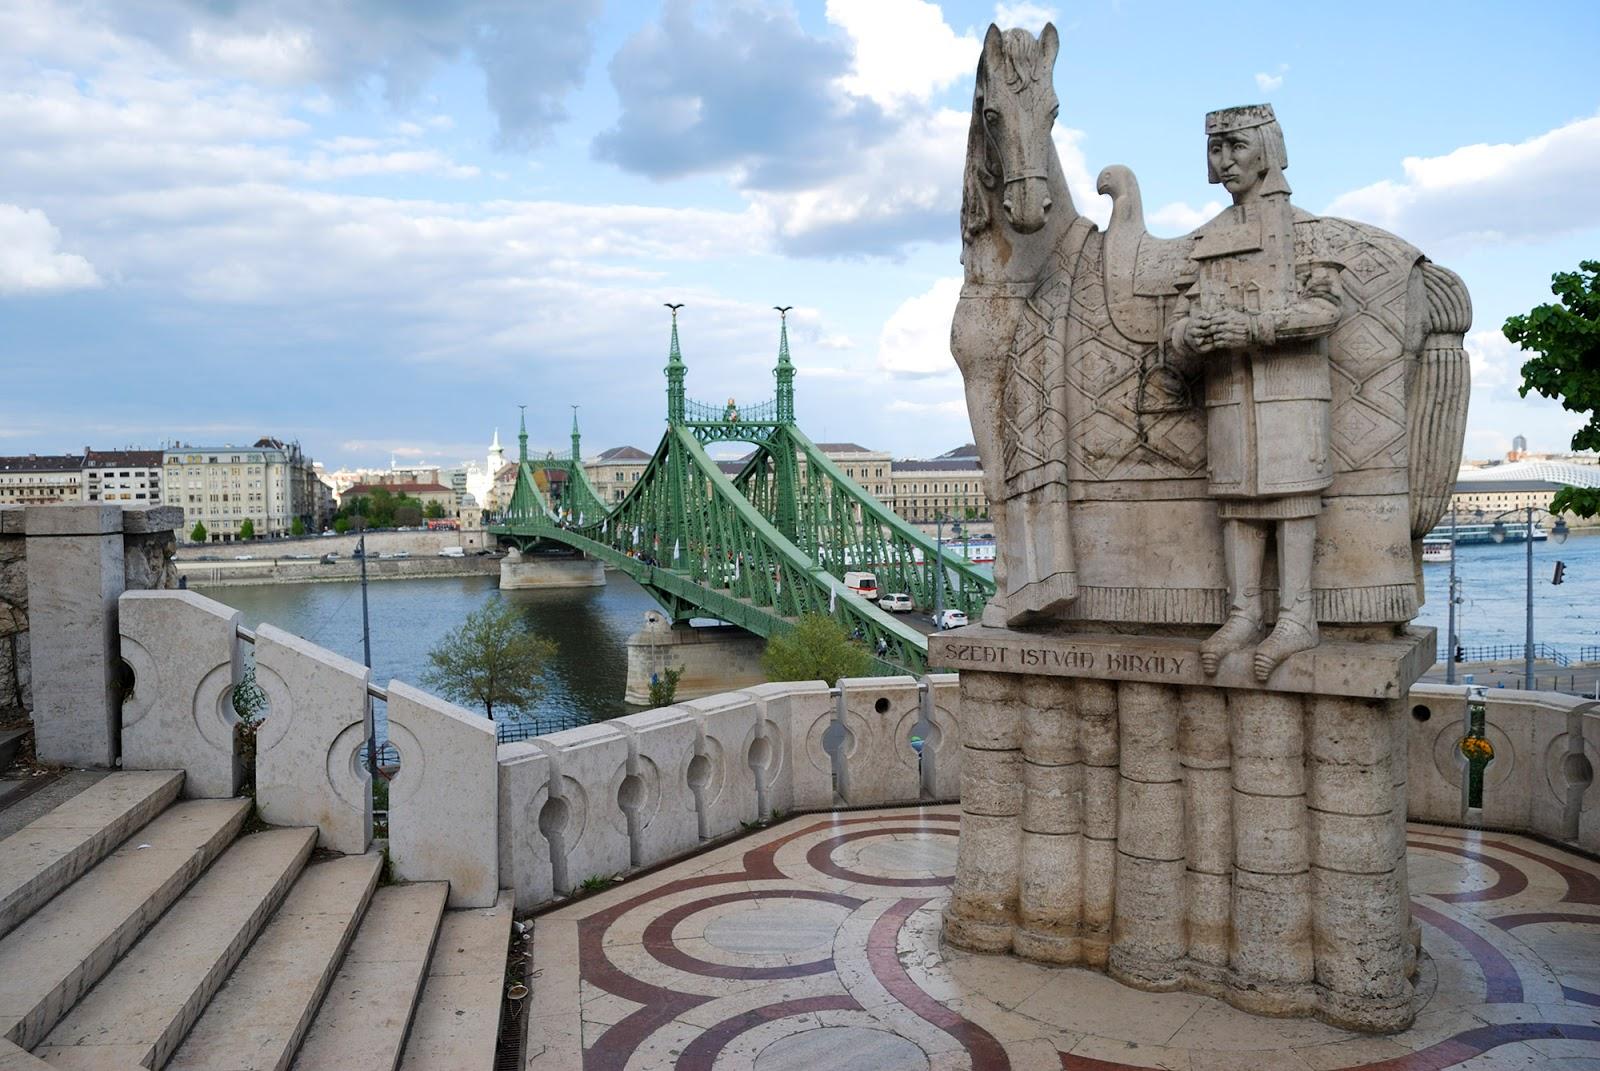 budapest guide itinerary instagram worthy spot sights landmarks hungary liberty bridge citadella gellert hill